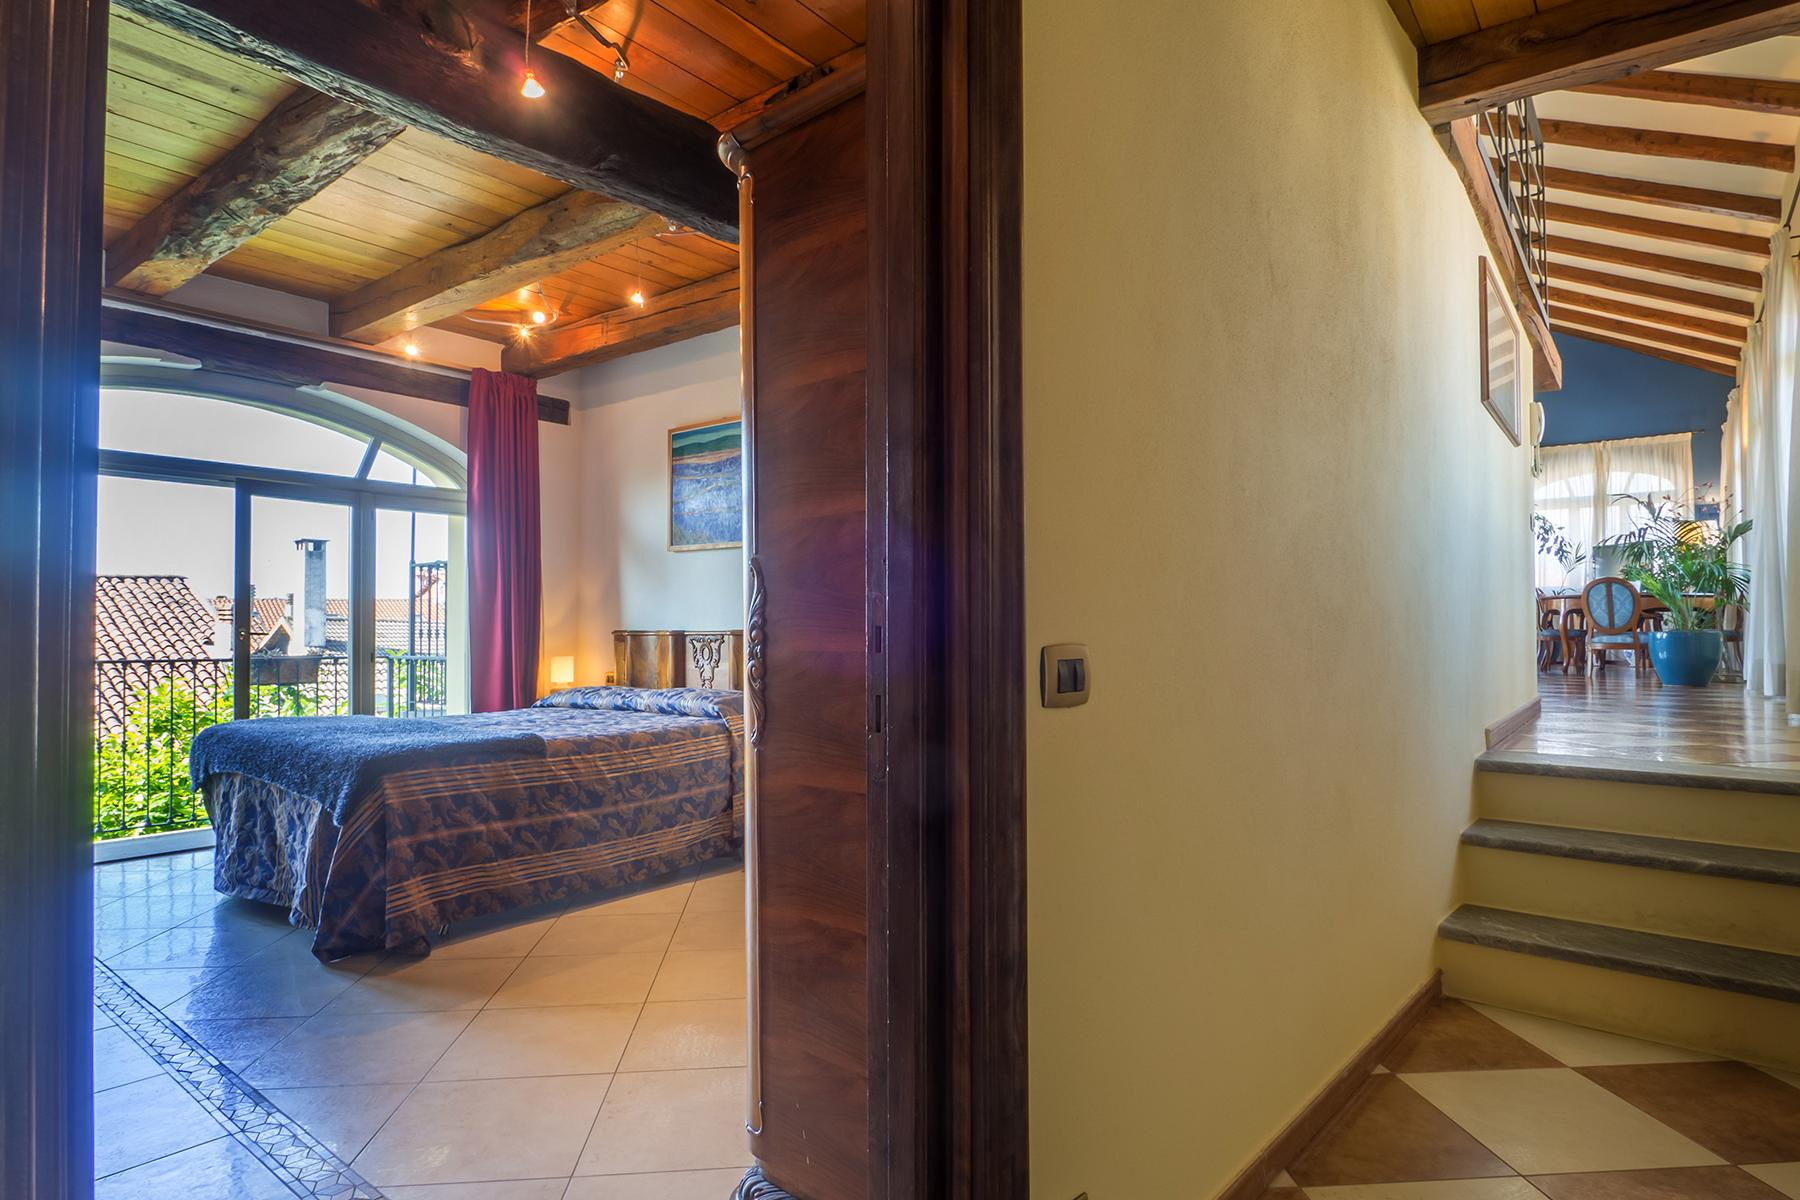 Elegant apartment in the Canavese region - 17